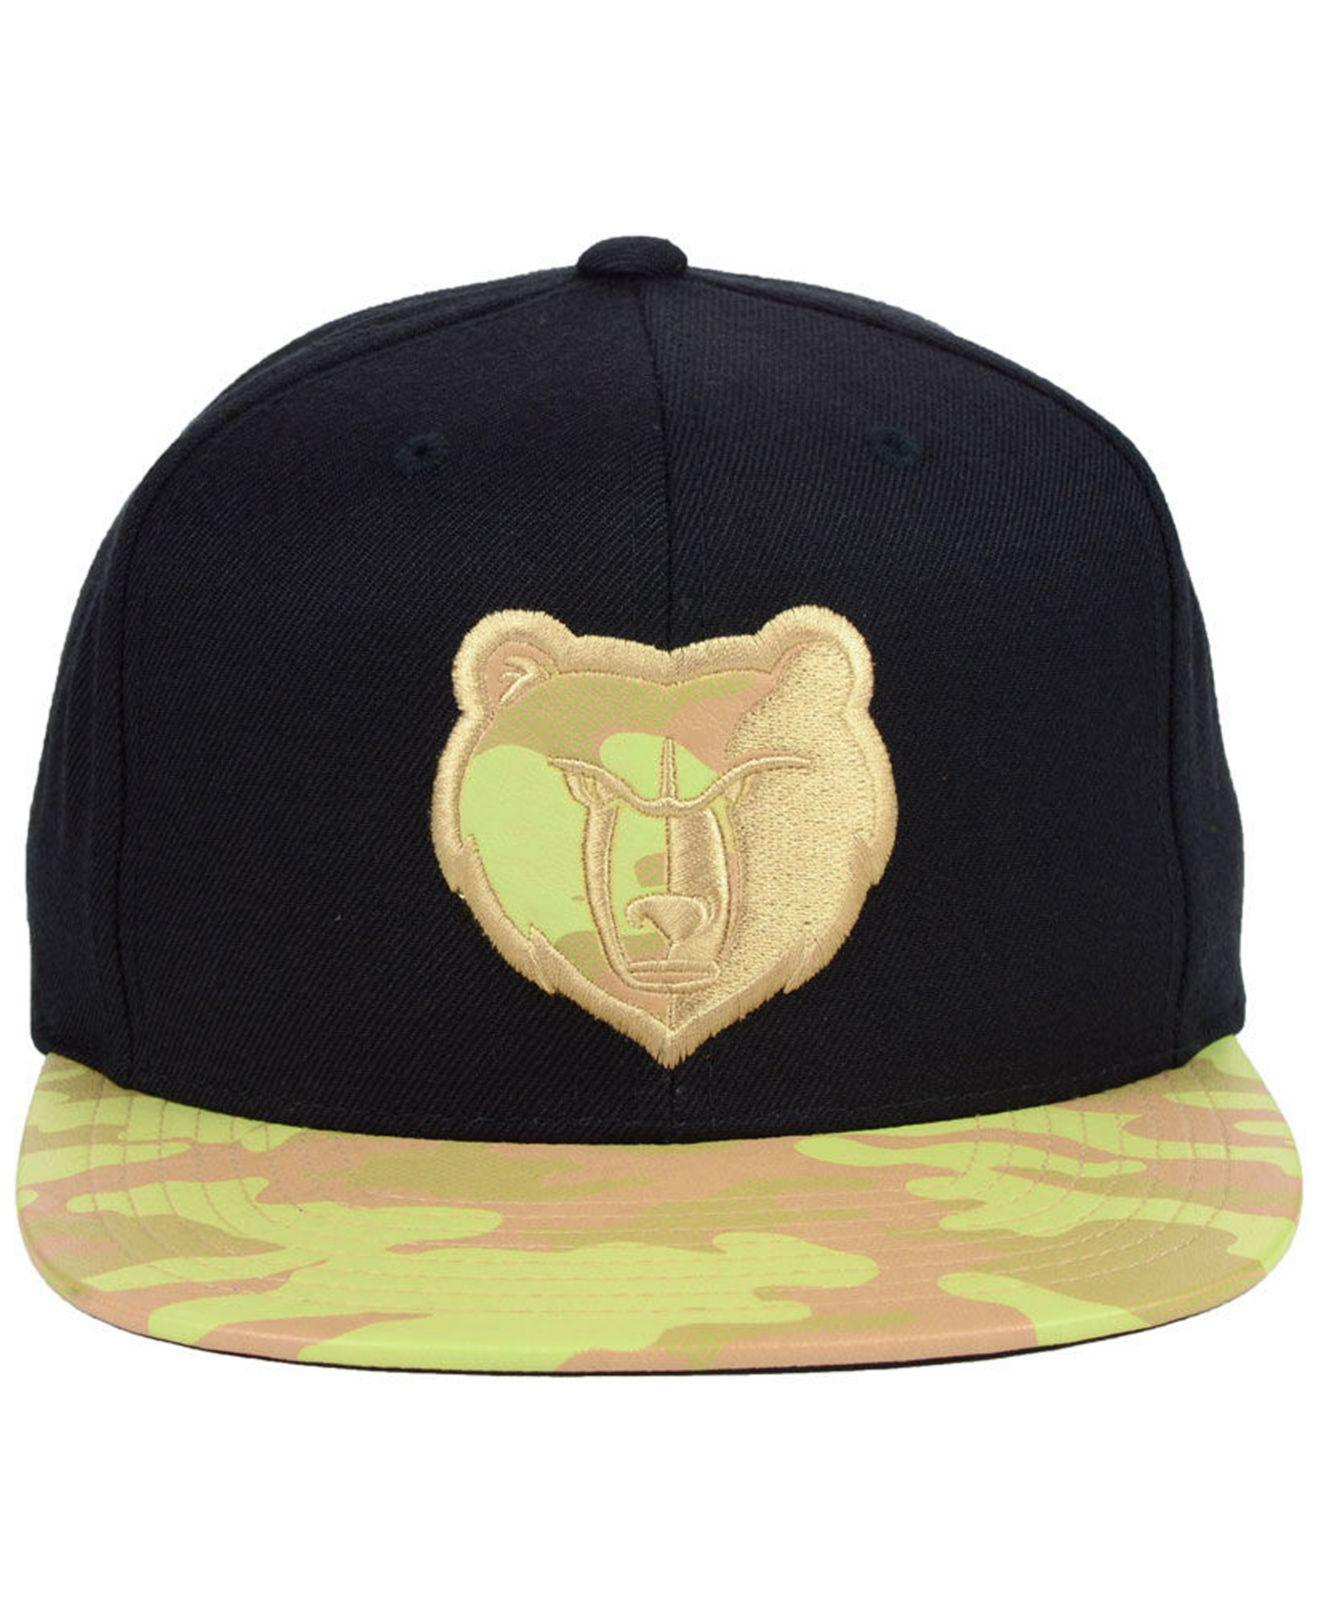 size 40 9998d d166c ... hot lyst mitchell ness memphis grizzlies natural camo snapback cap in  black for men 0b98e dd582